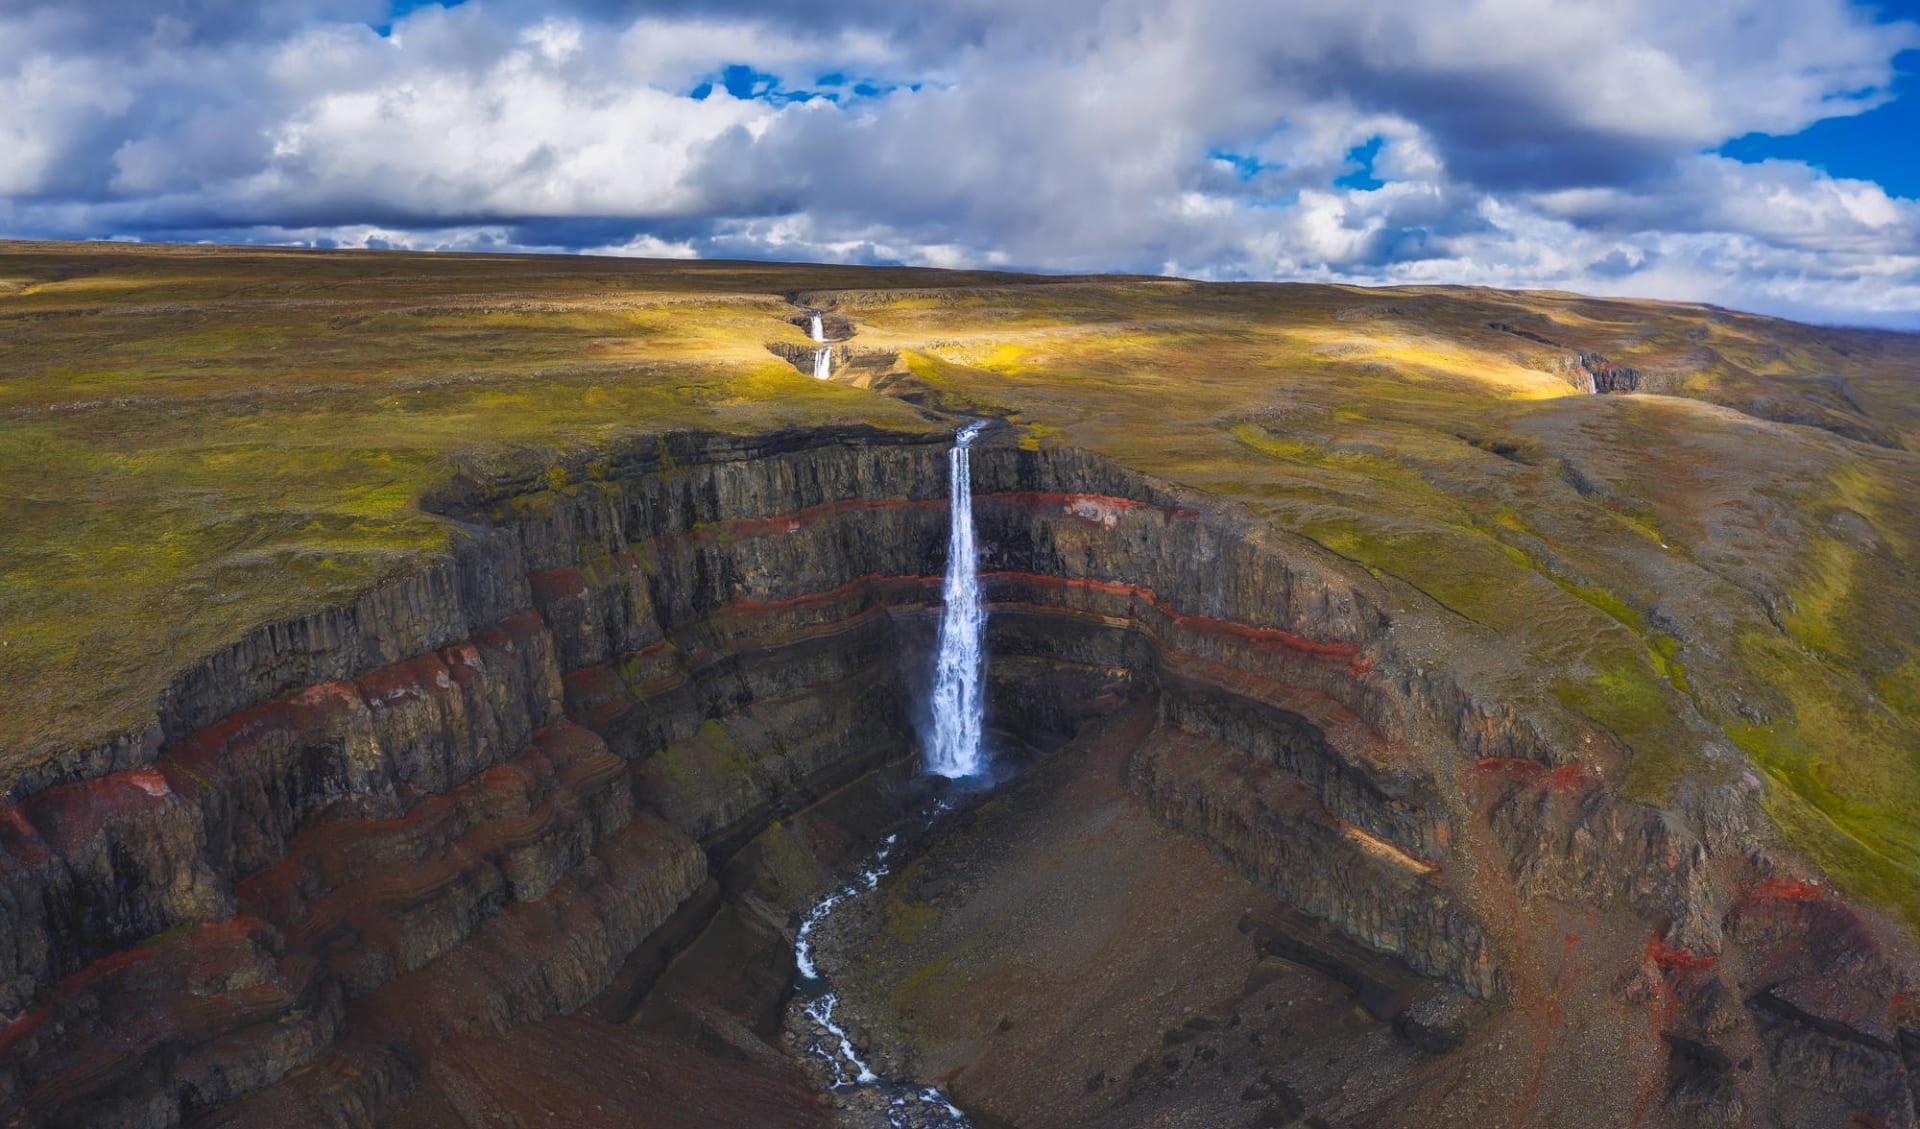 Hengifoss Guesthouse in Faskrudsfördur: Aerial view of the Hengifoss waterfall in East Iceland.